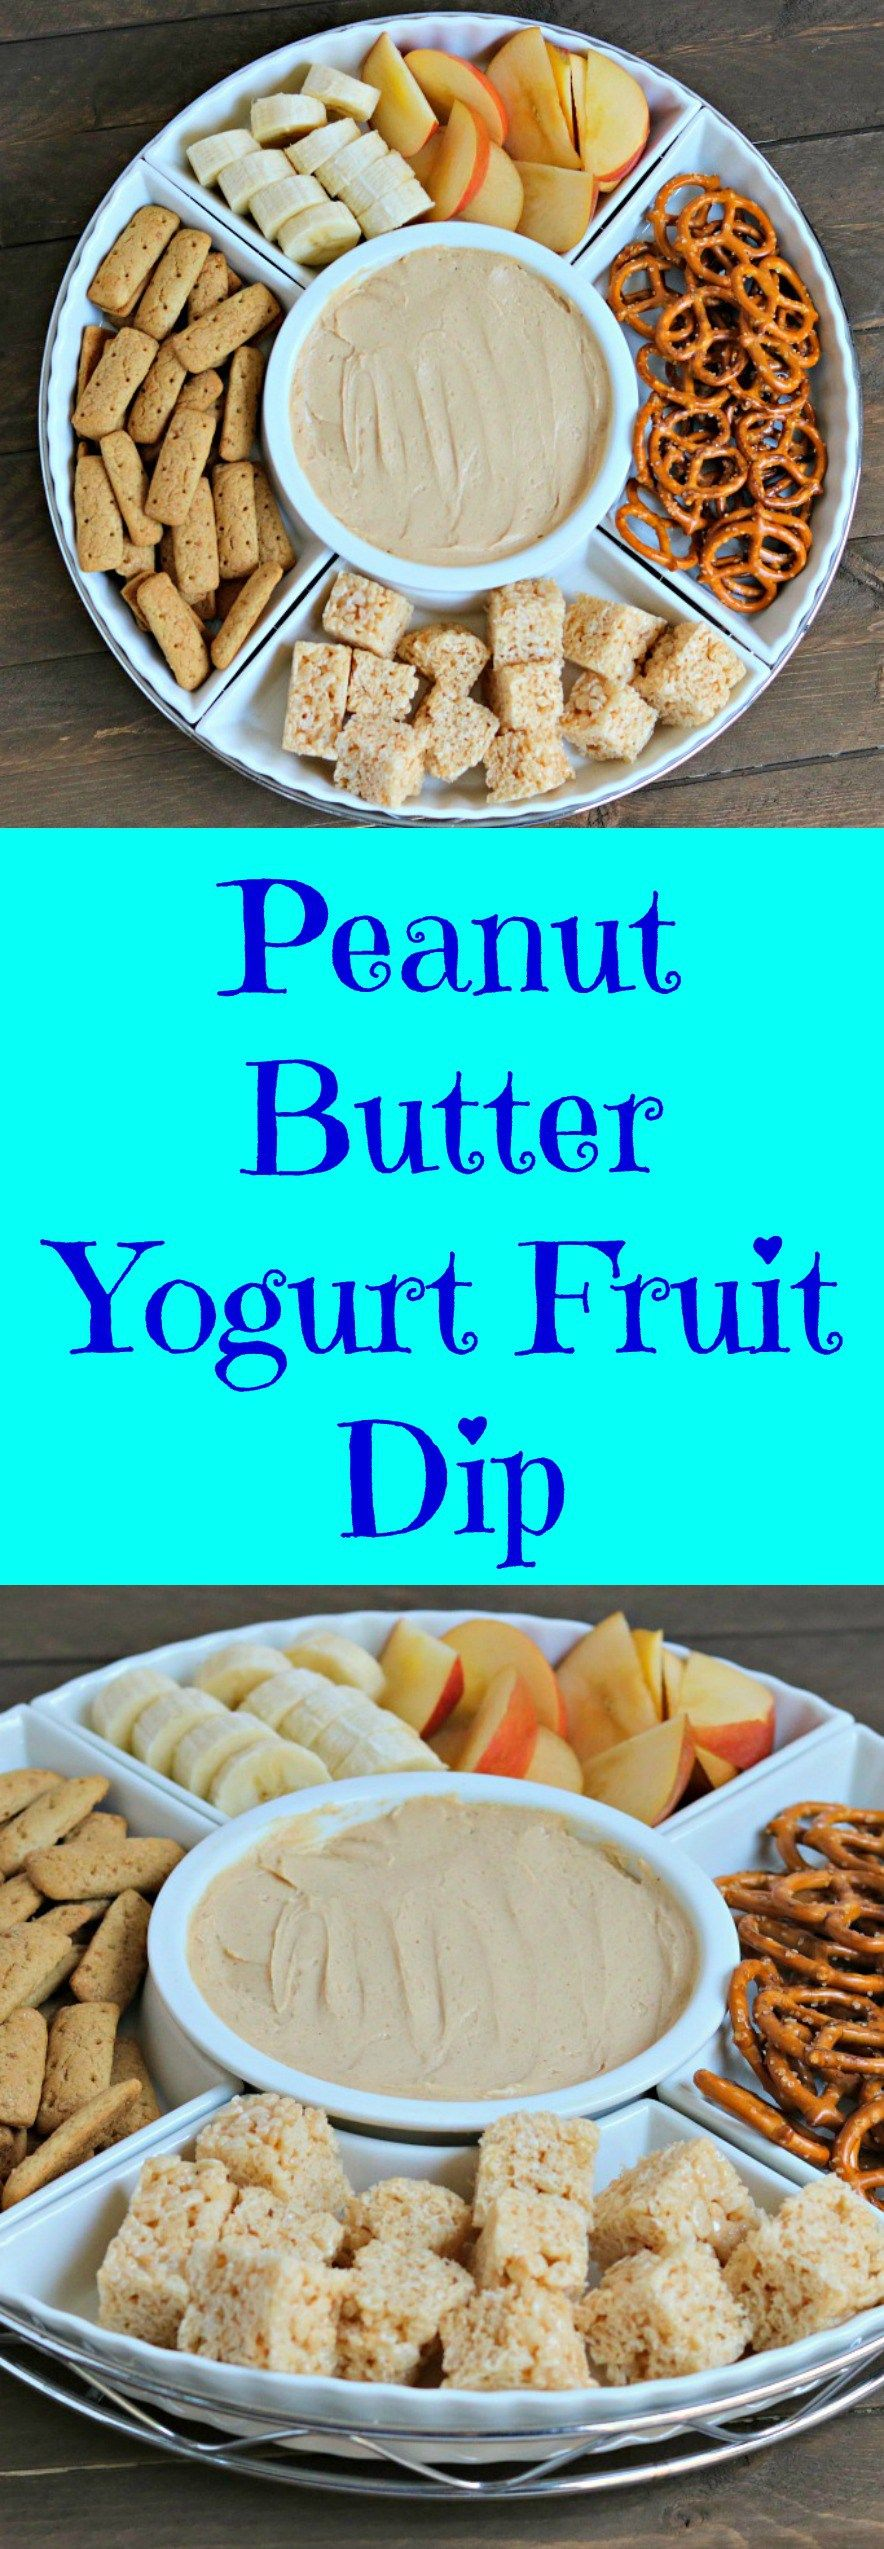 peanut butter yogurt fruit dip + a free back to school book offer! #ad #SamsClubBTS, #StartSchoolLikeAChampion #Pmedia @ricekrispiesusa @jifpeanutbutter @samsclub